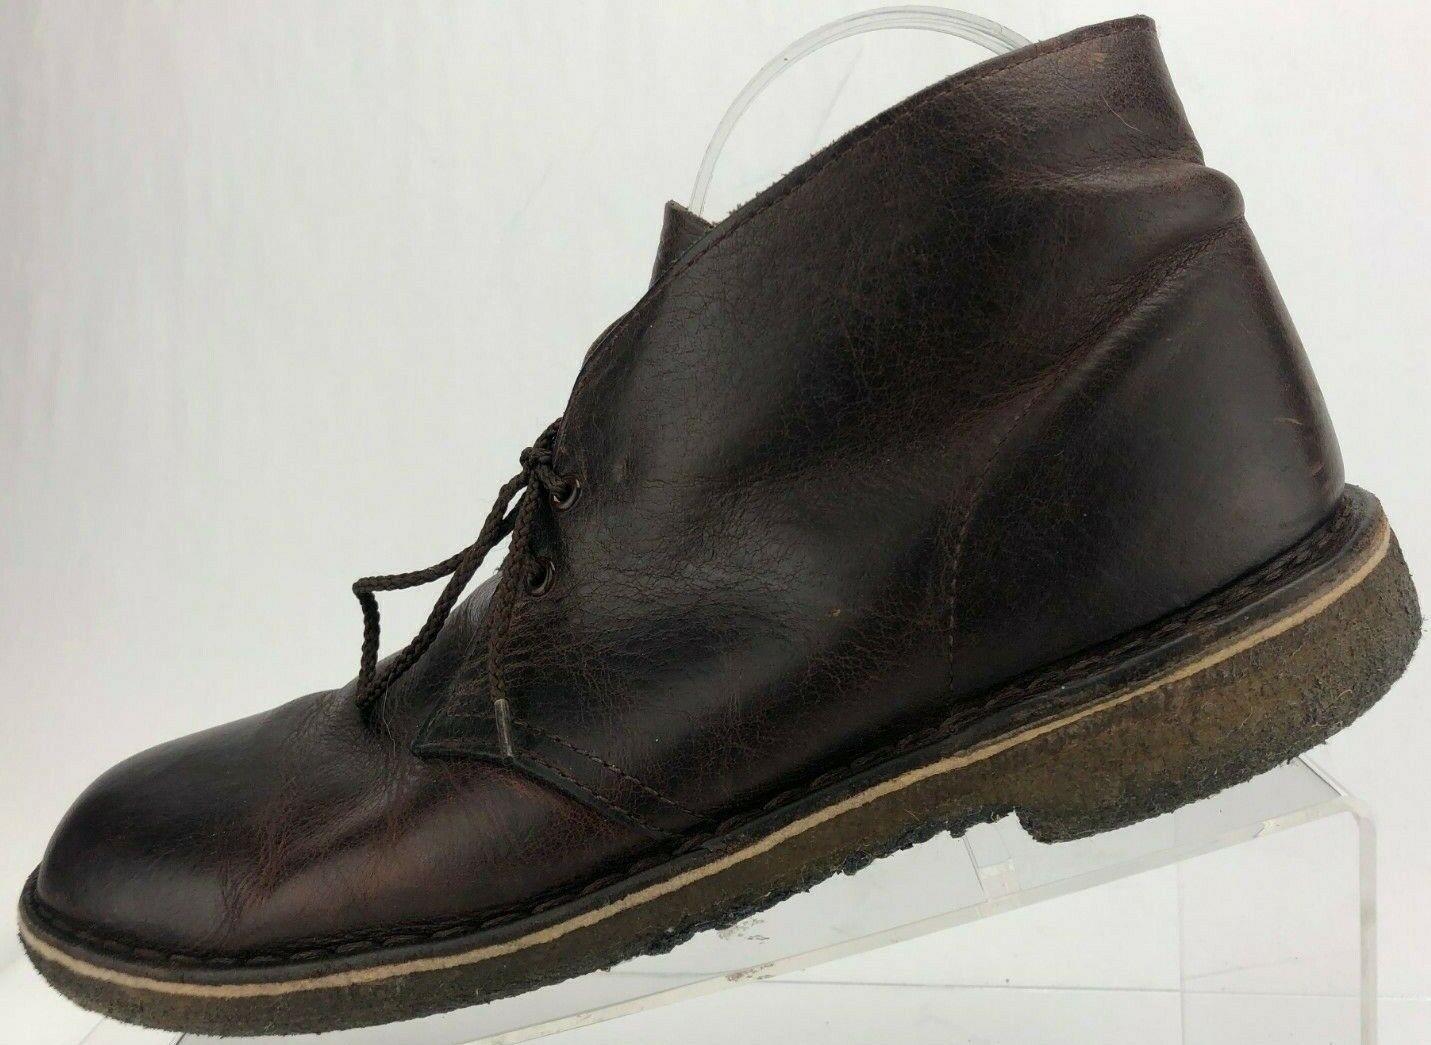 Clarks Originals Ankle stivali Marrone Crepe Sole Lace Up Up Up Desert Chukka Uomo 9.5 M 0ee4c7